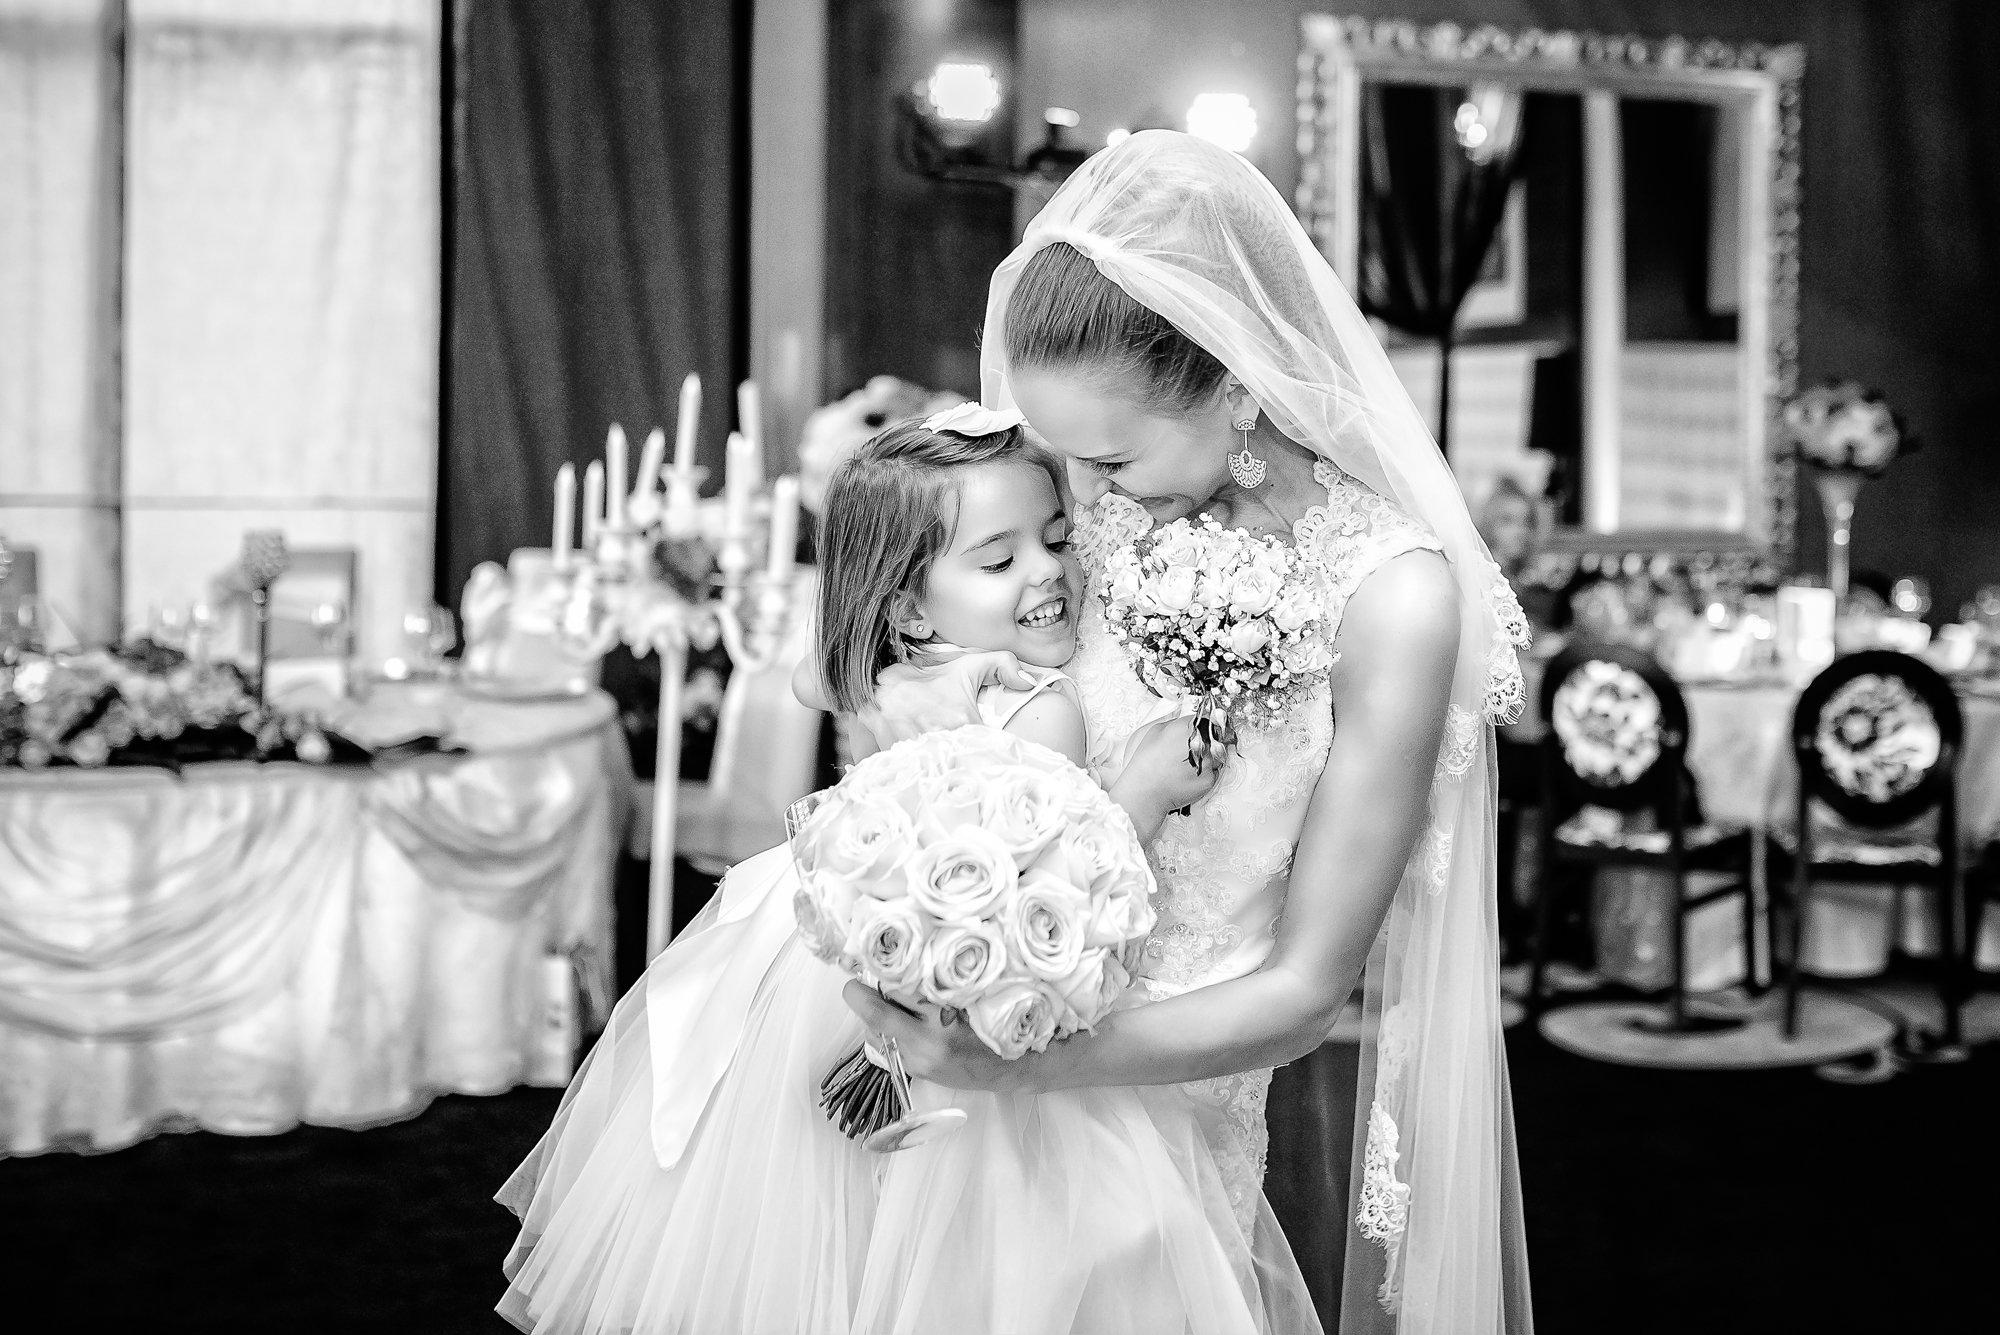 alexandru madalina wedding day 43